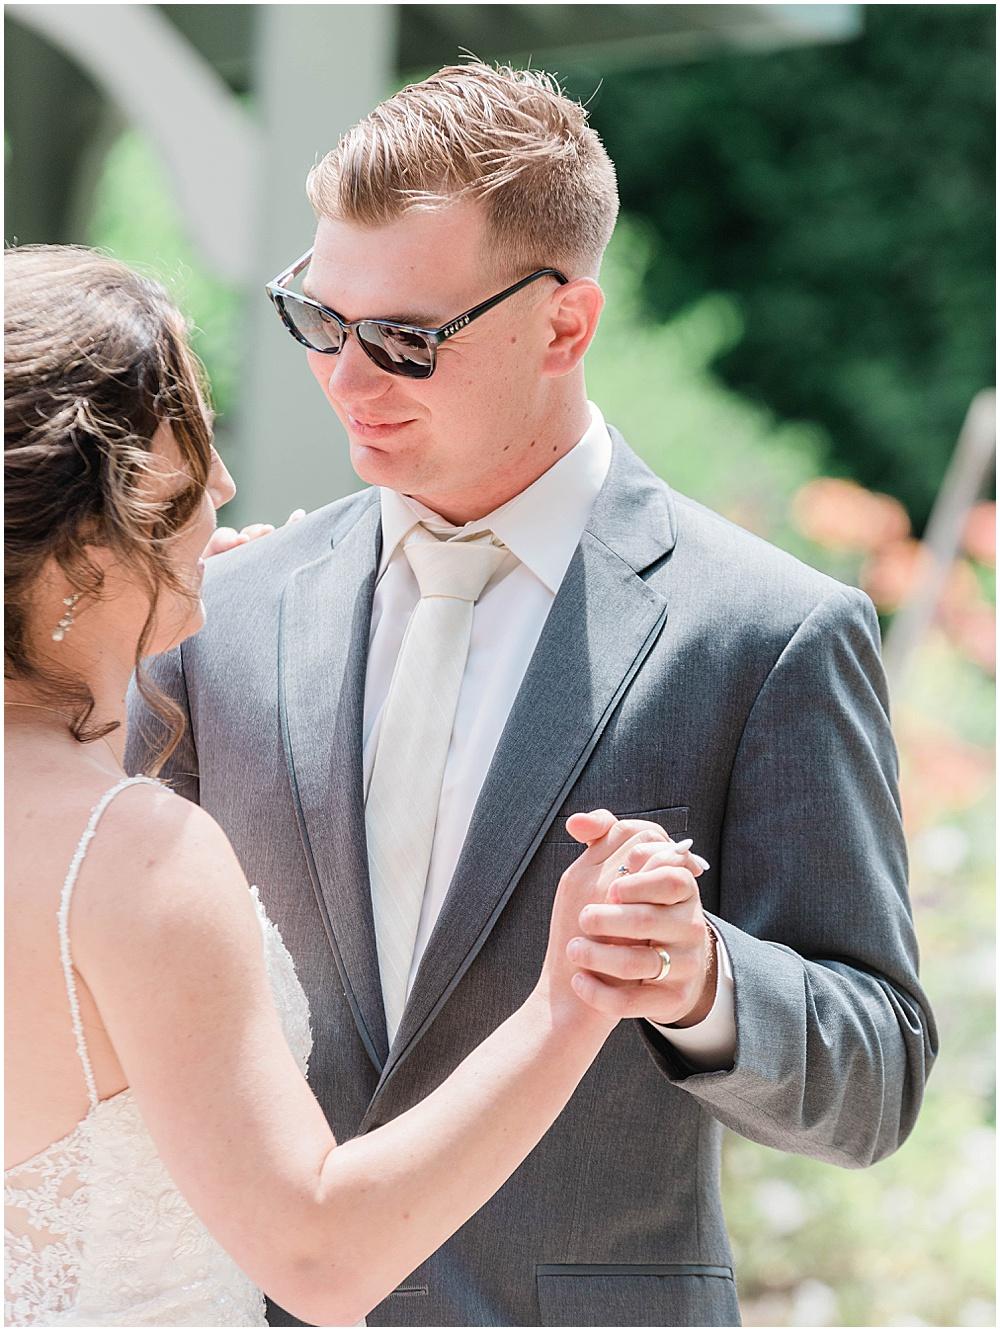 Samantha McPherrin Photography-Chico Wedding Photographer_0058.jpg